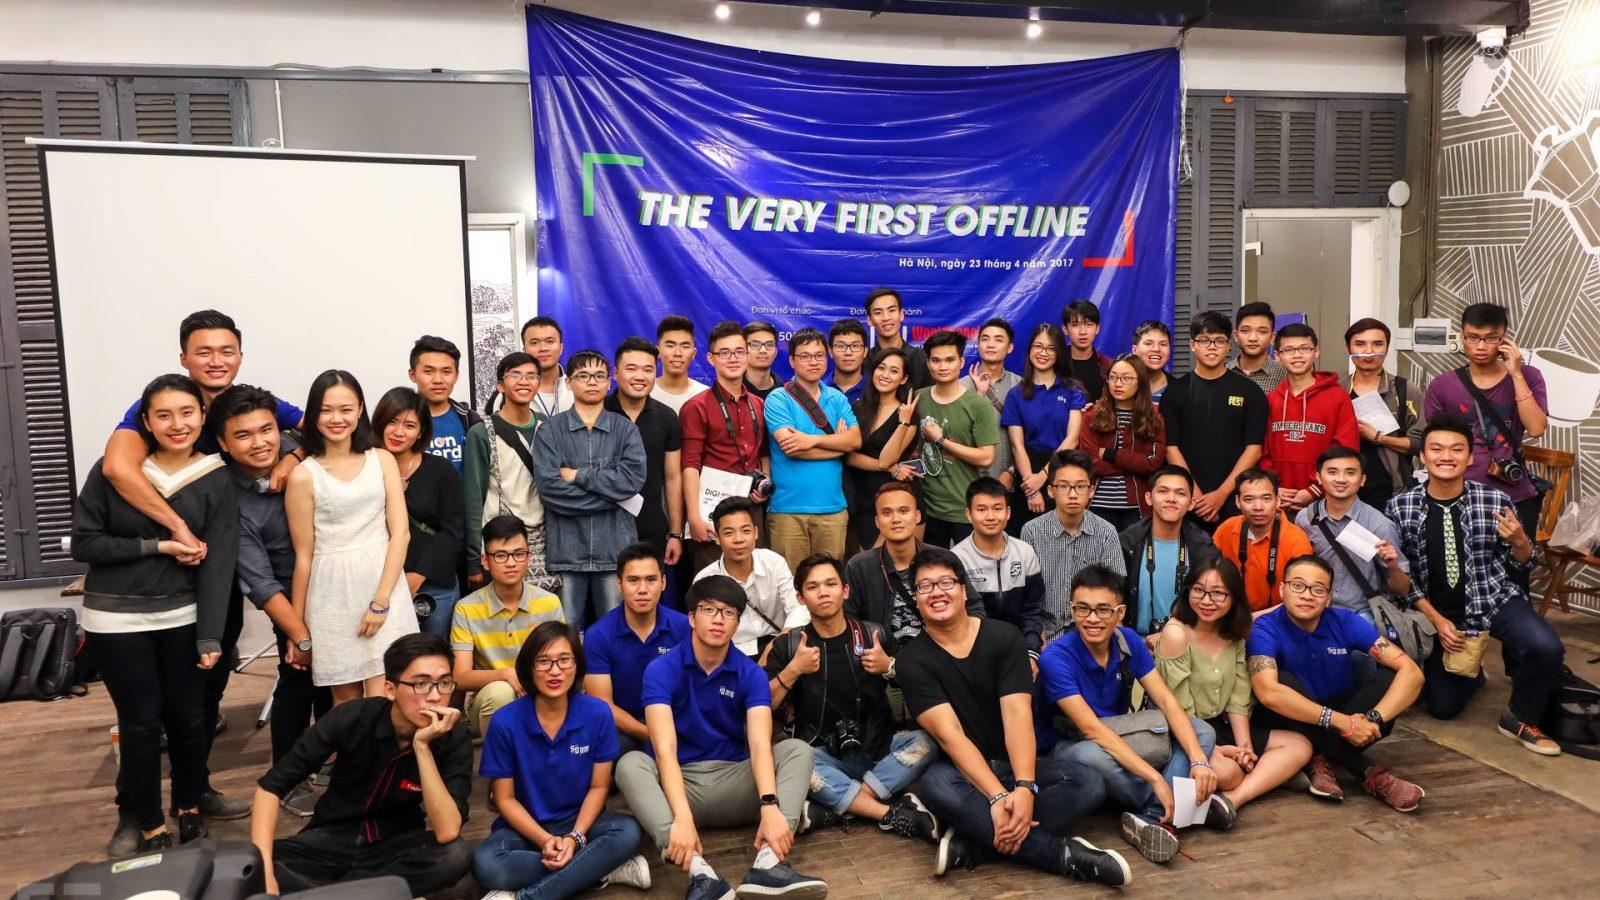 50mm Vietnam - The Very First Offline   50mm Vietnam